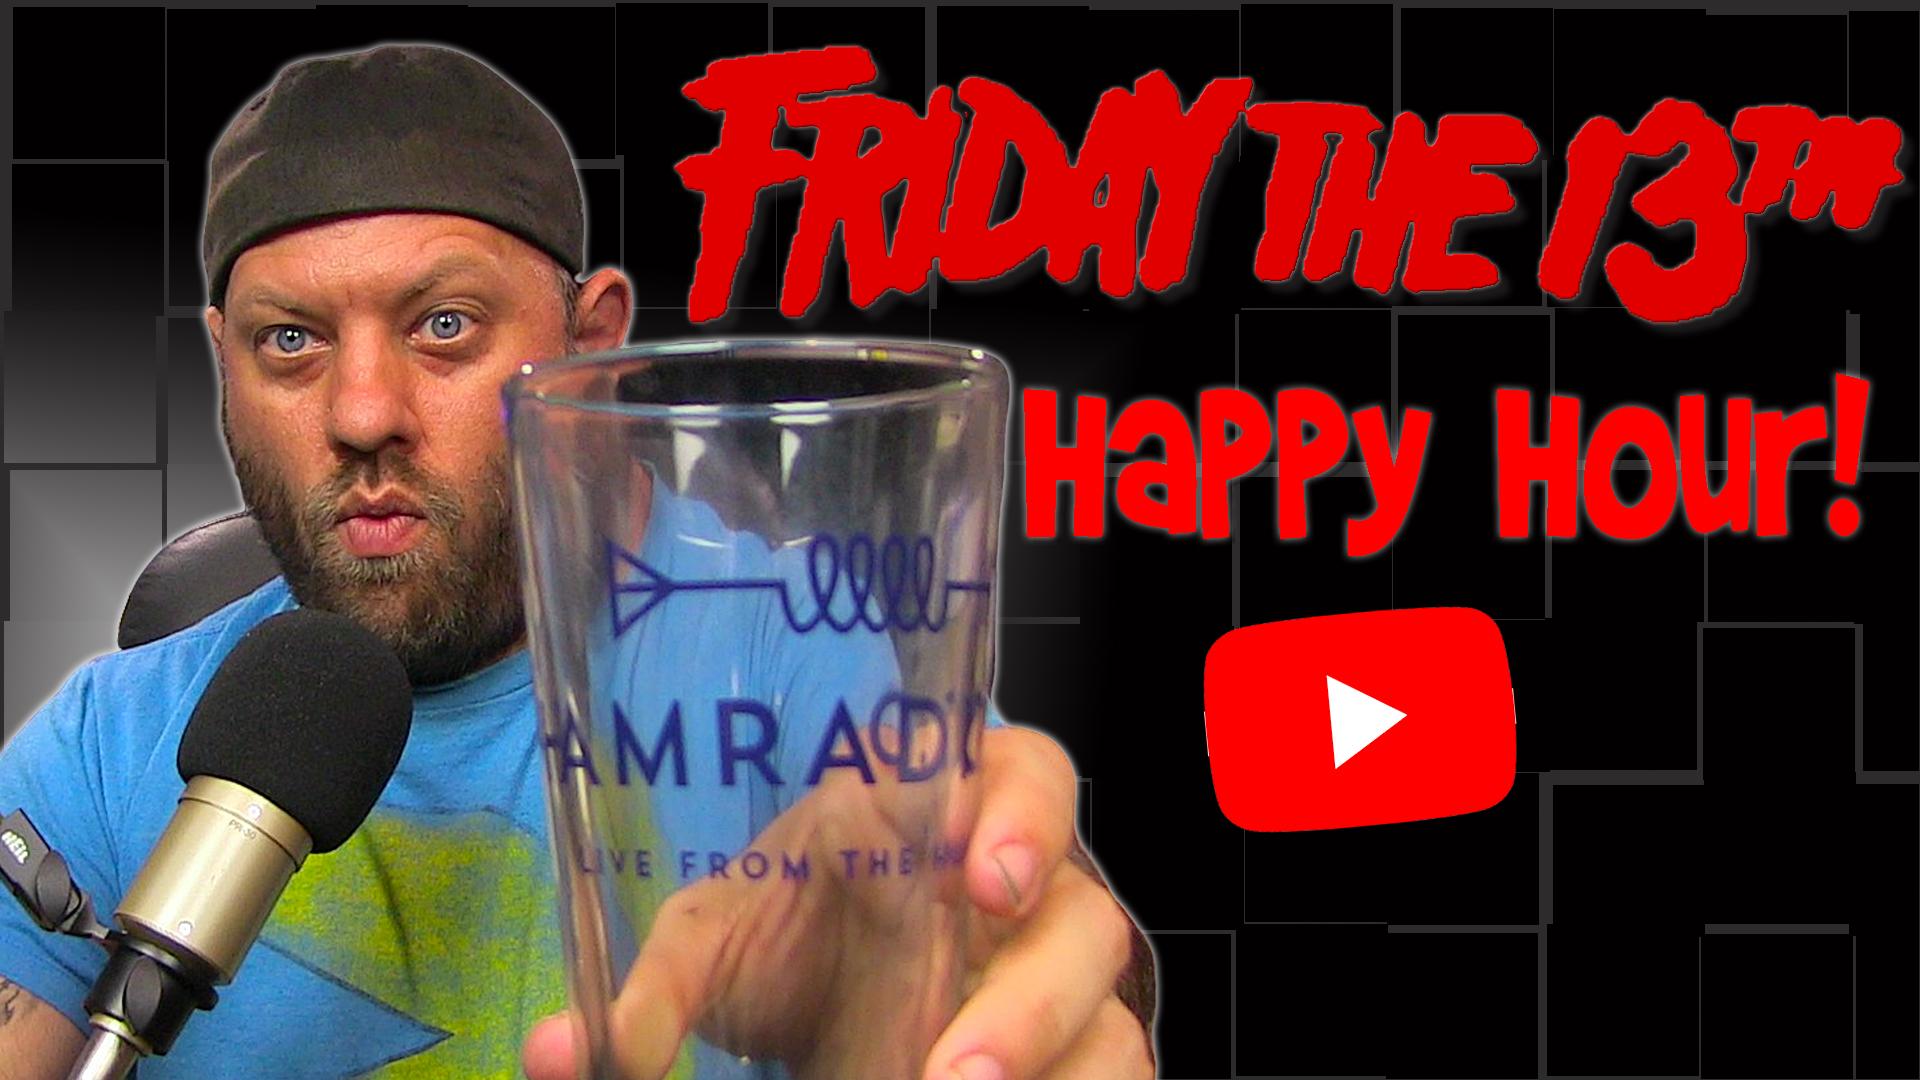 Episode 493: Friday the 13th Ham Radio Happy Hour!